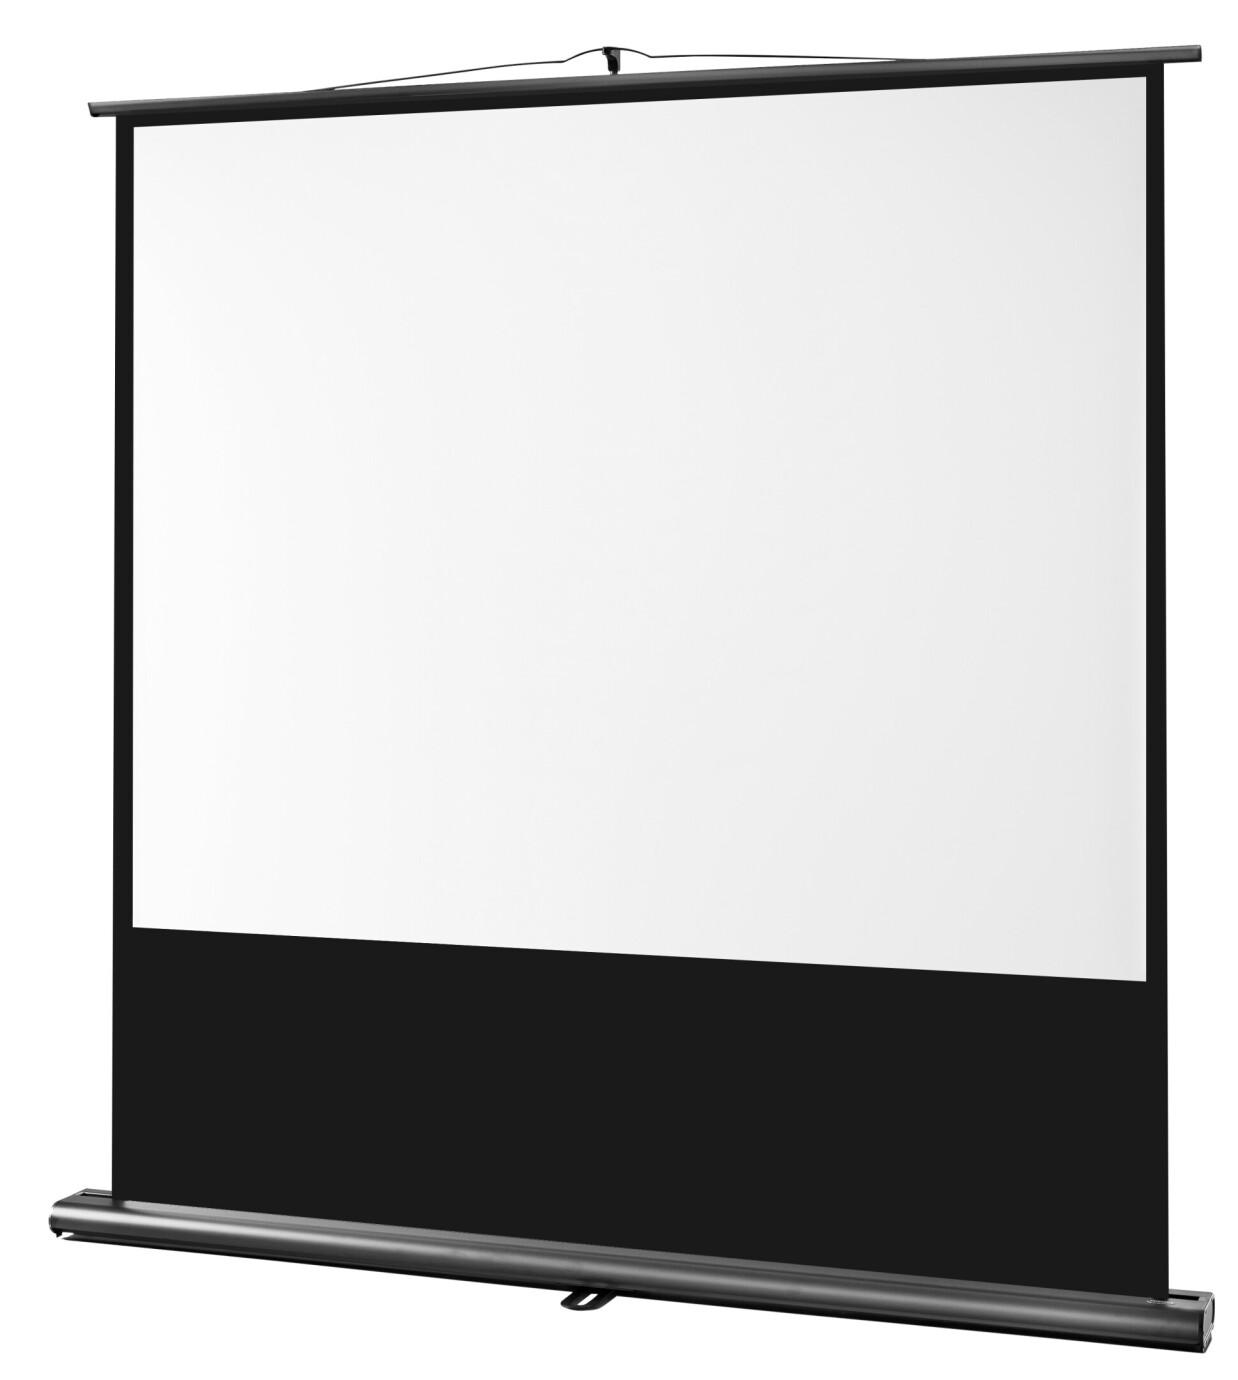 Celexon - Ultramobile Professional - 120cm x 90cm - 4:3 Portable Projector Screen - 1091784 - 4:3